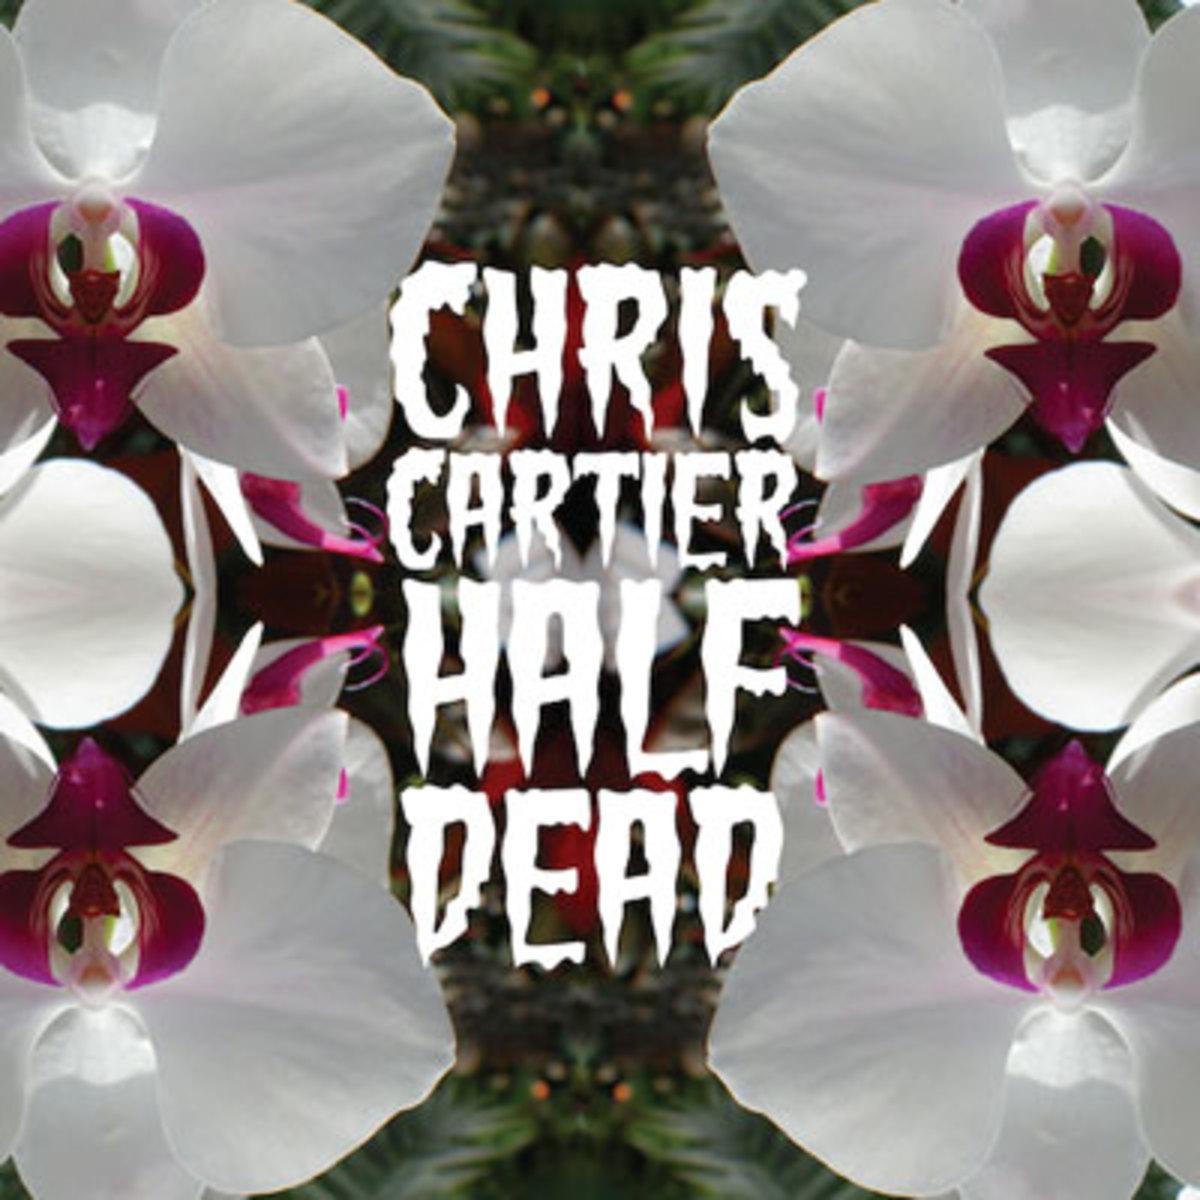 chriscartier-halfdead.jpg